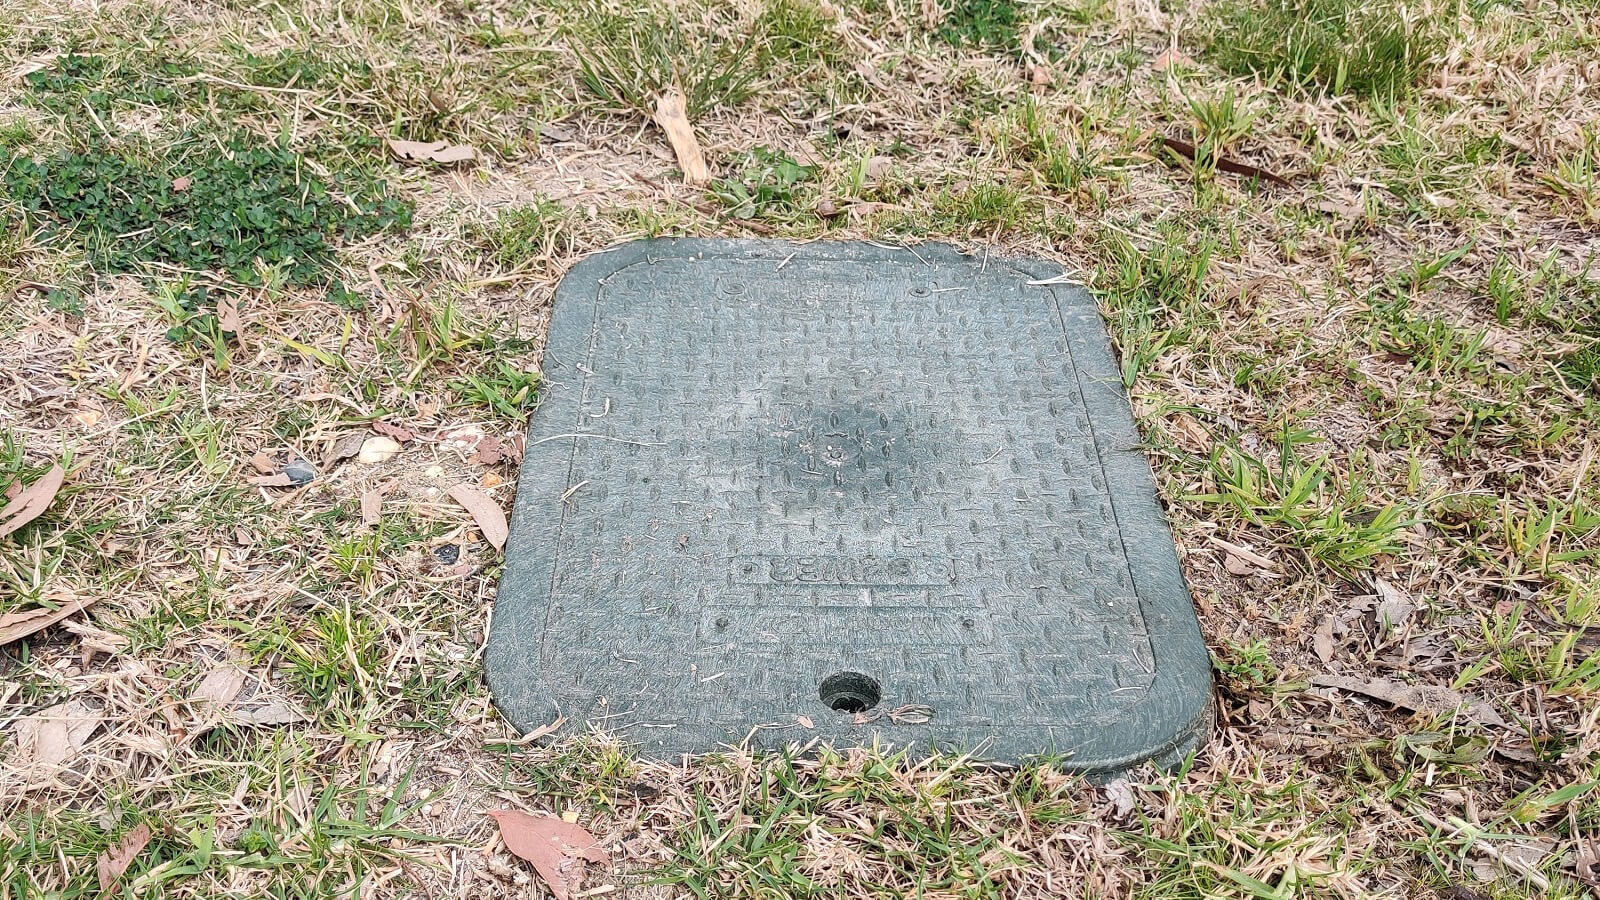 A pressure sewage system boundary kit